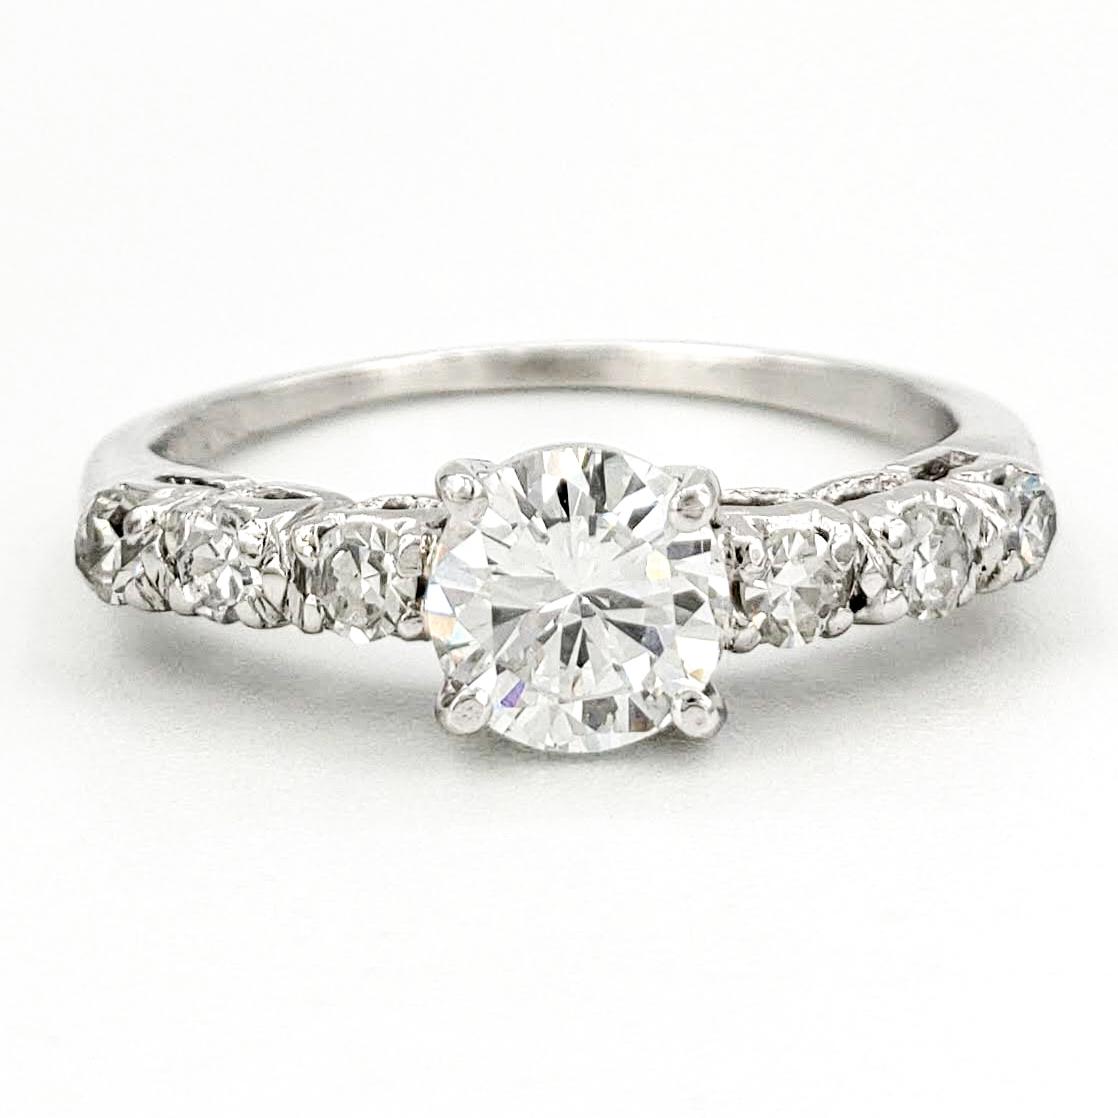 vintage-platinum-engagement-ring-with-0-55-carat-round-brilliant-cut-diamond-egl-d-vs1